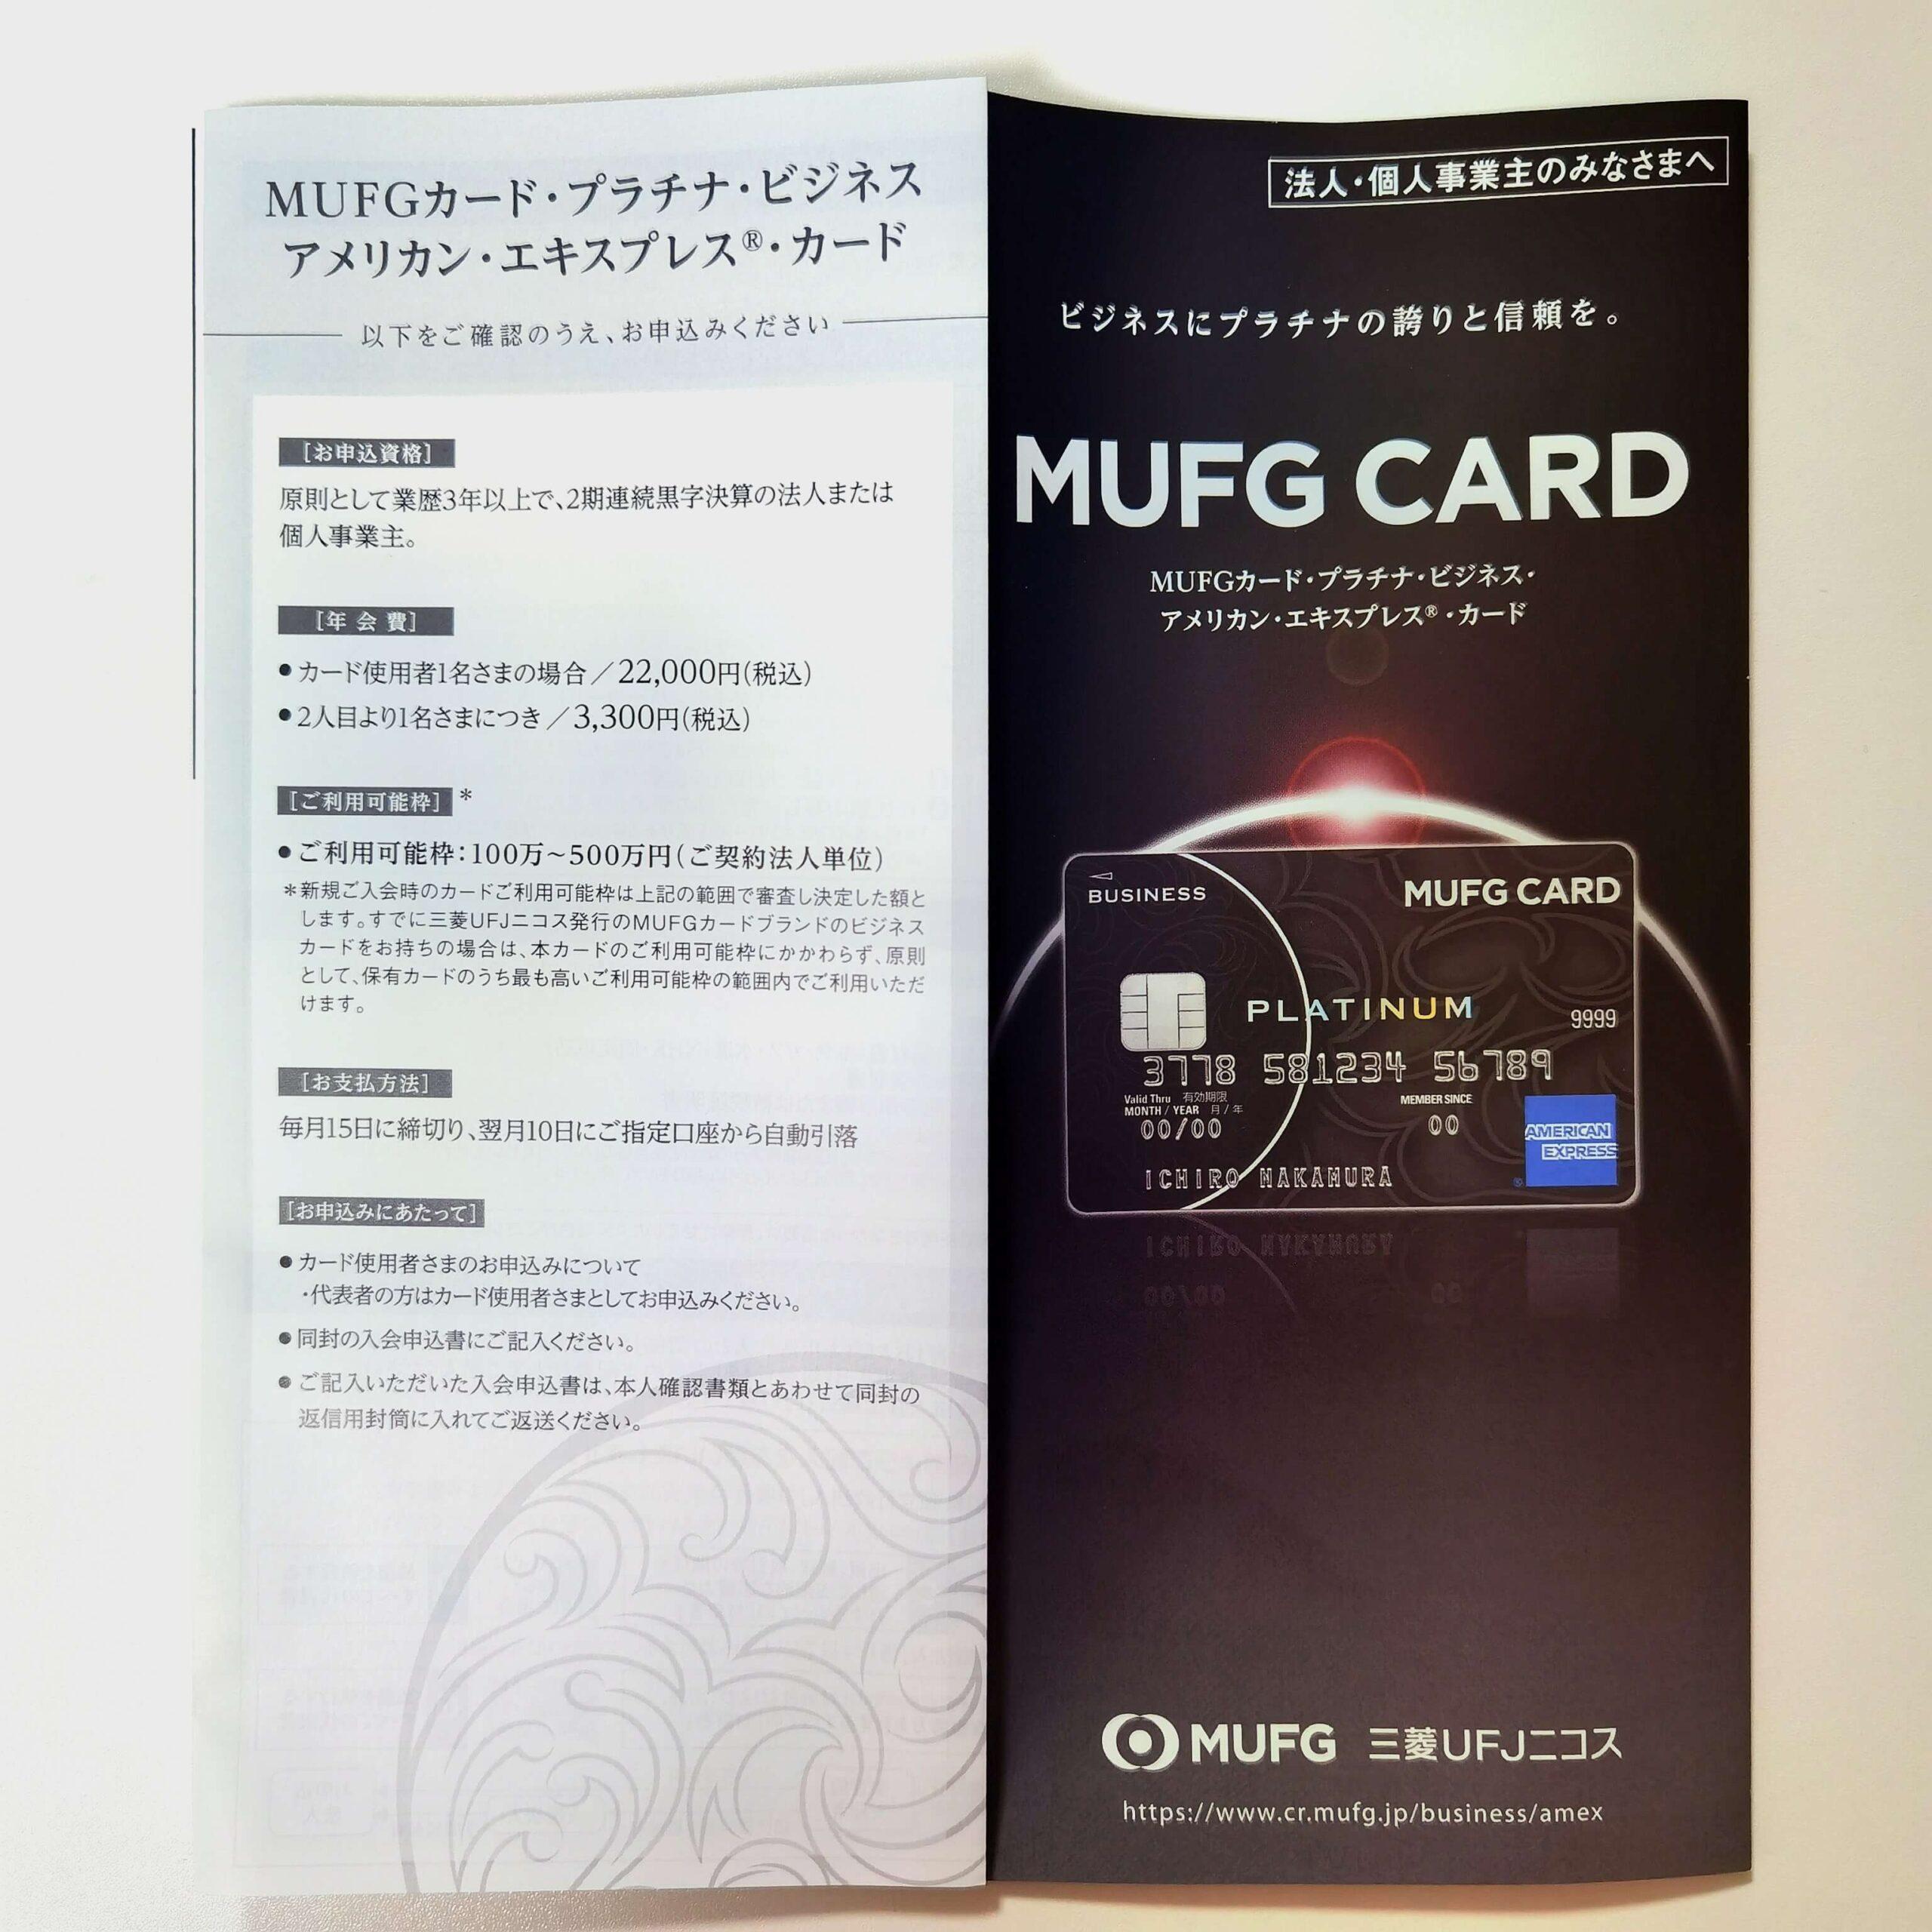 MUFGカード・プラチナビジネス・アメックスの利用限度額